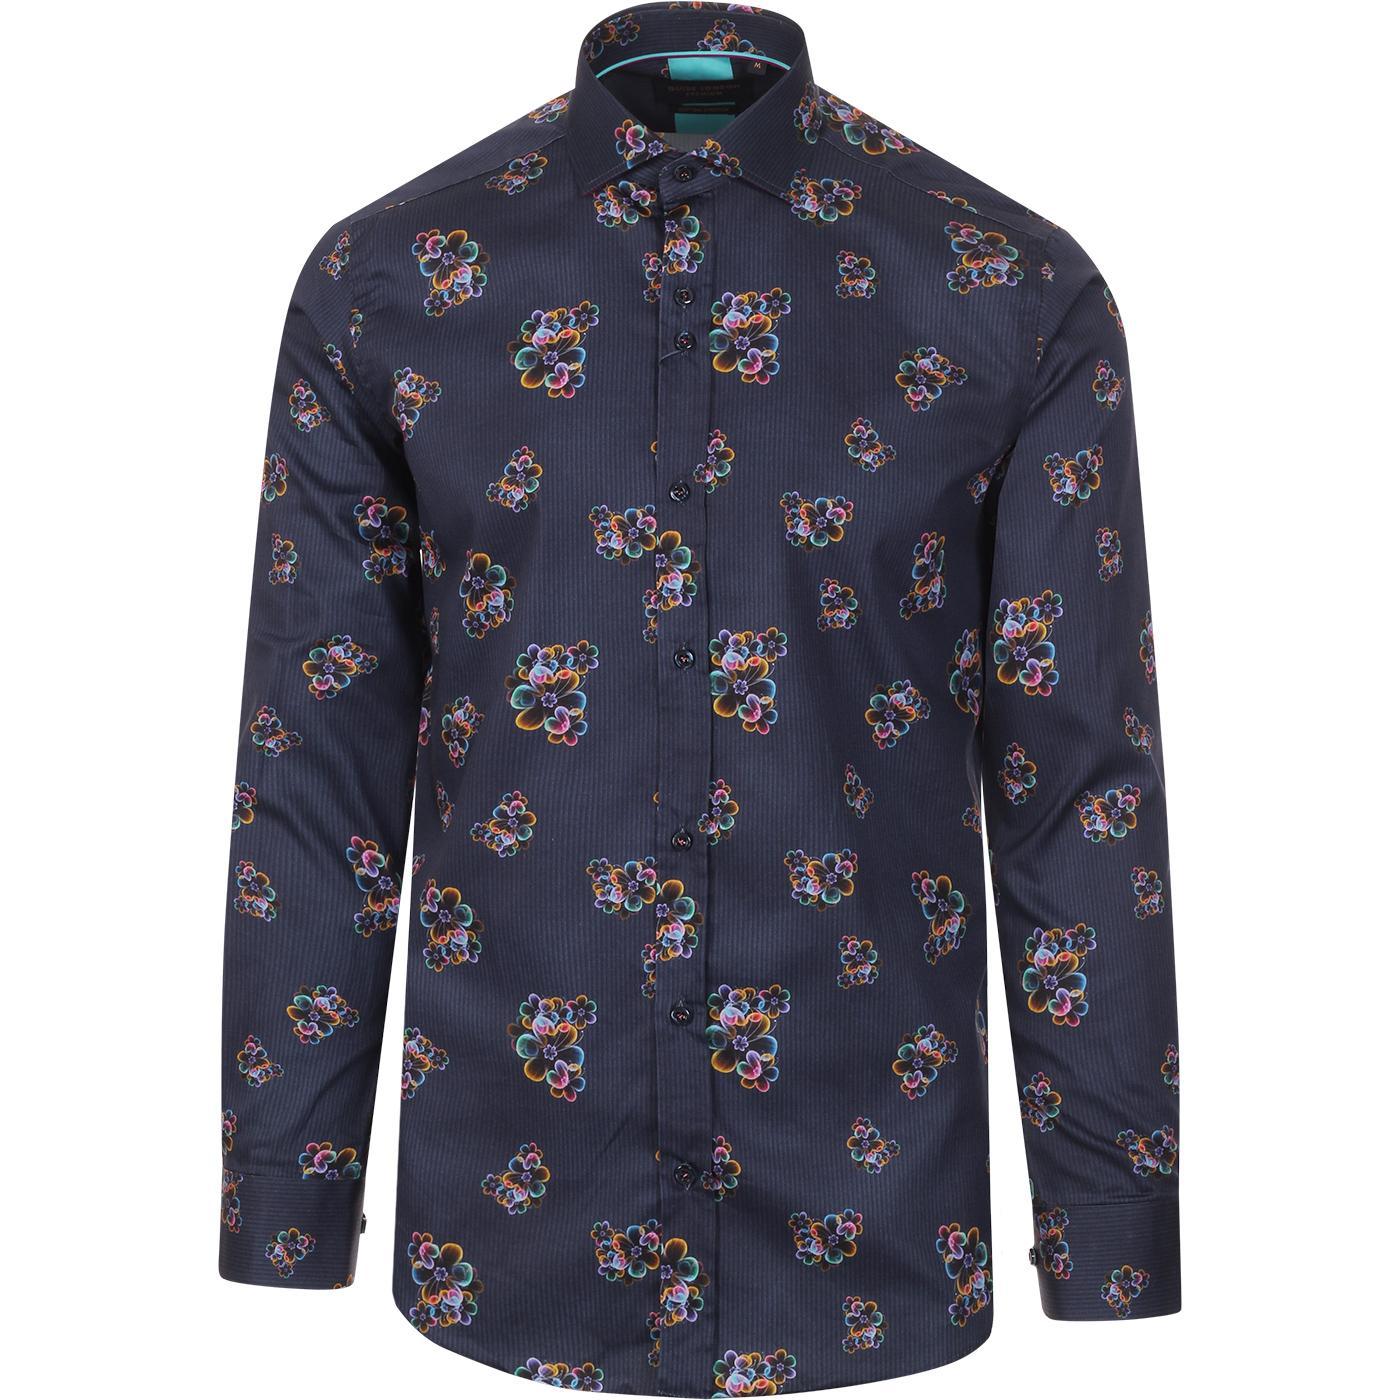 GUIDE LONDON Retro Mod Neon Floral Stripe Shirt